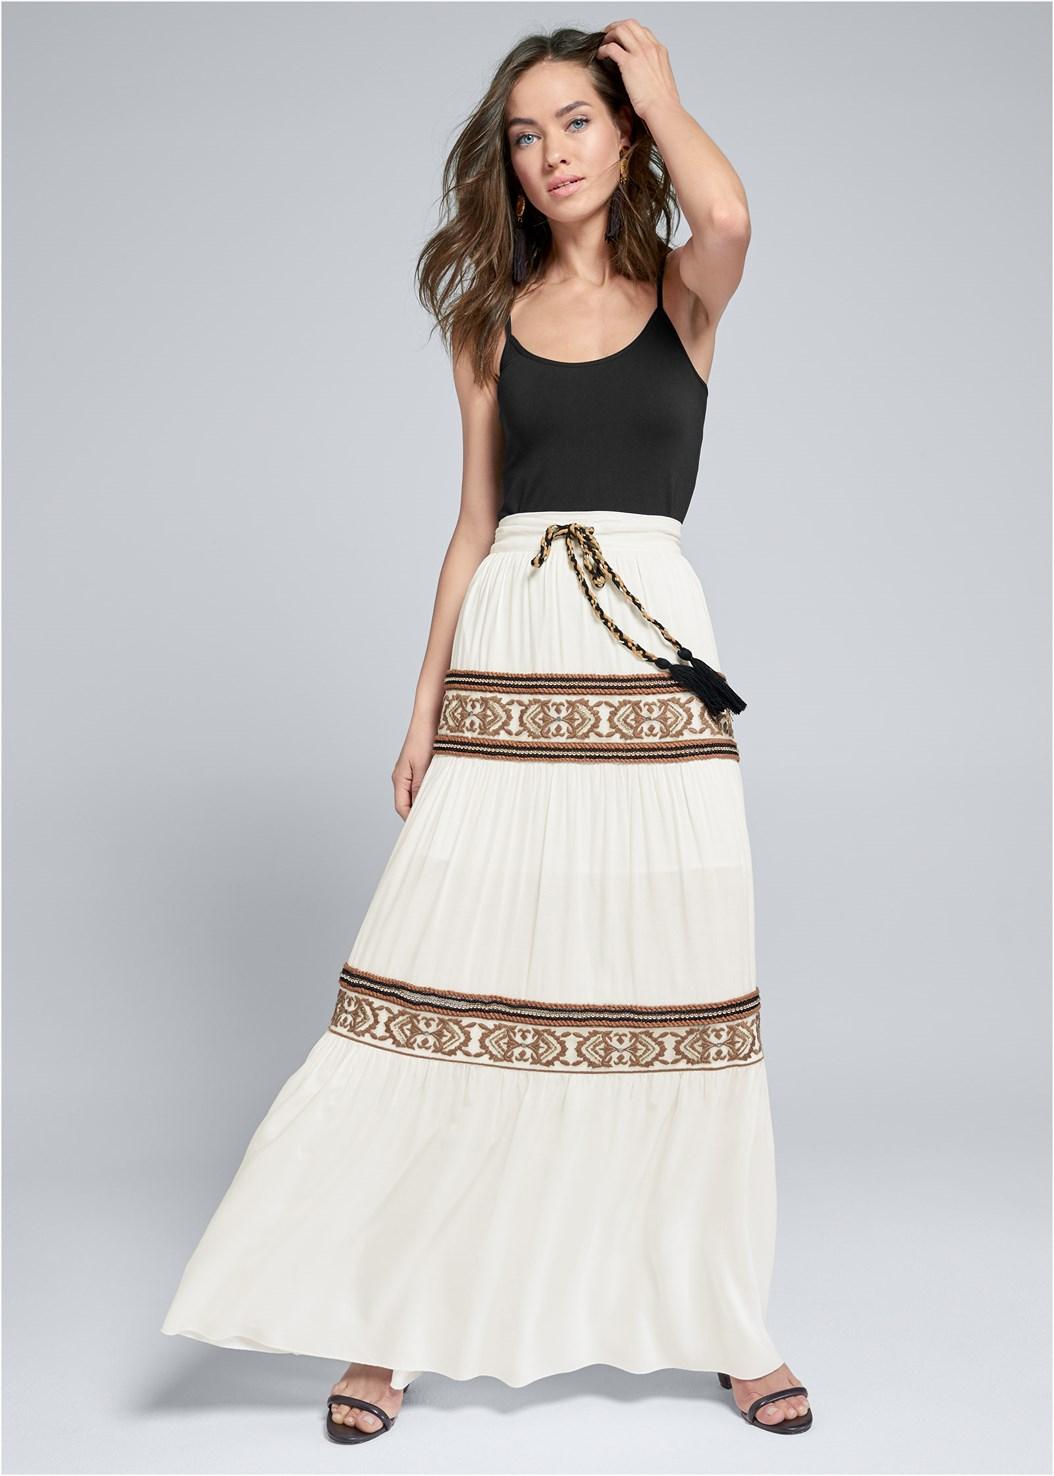 Gold Embellished Maxi Skirt,Basic Cami Two Pack,Block Heels